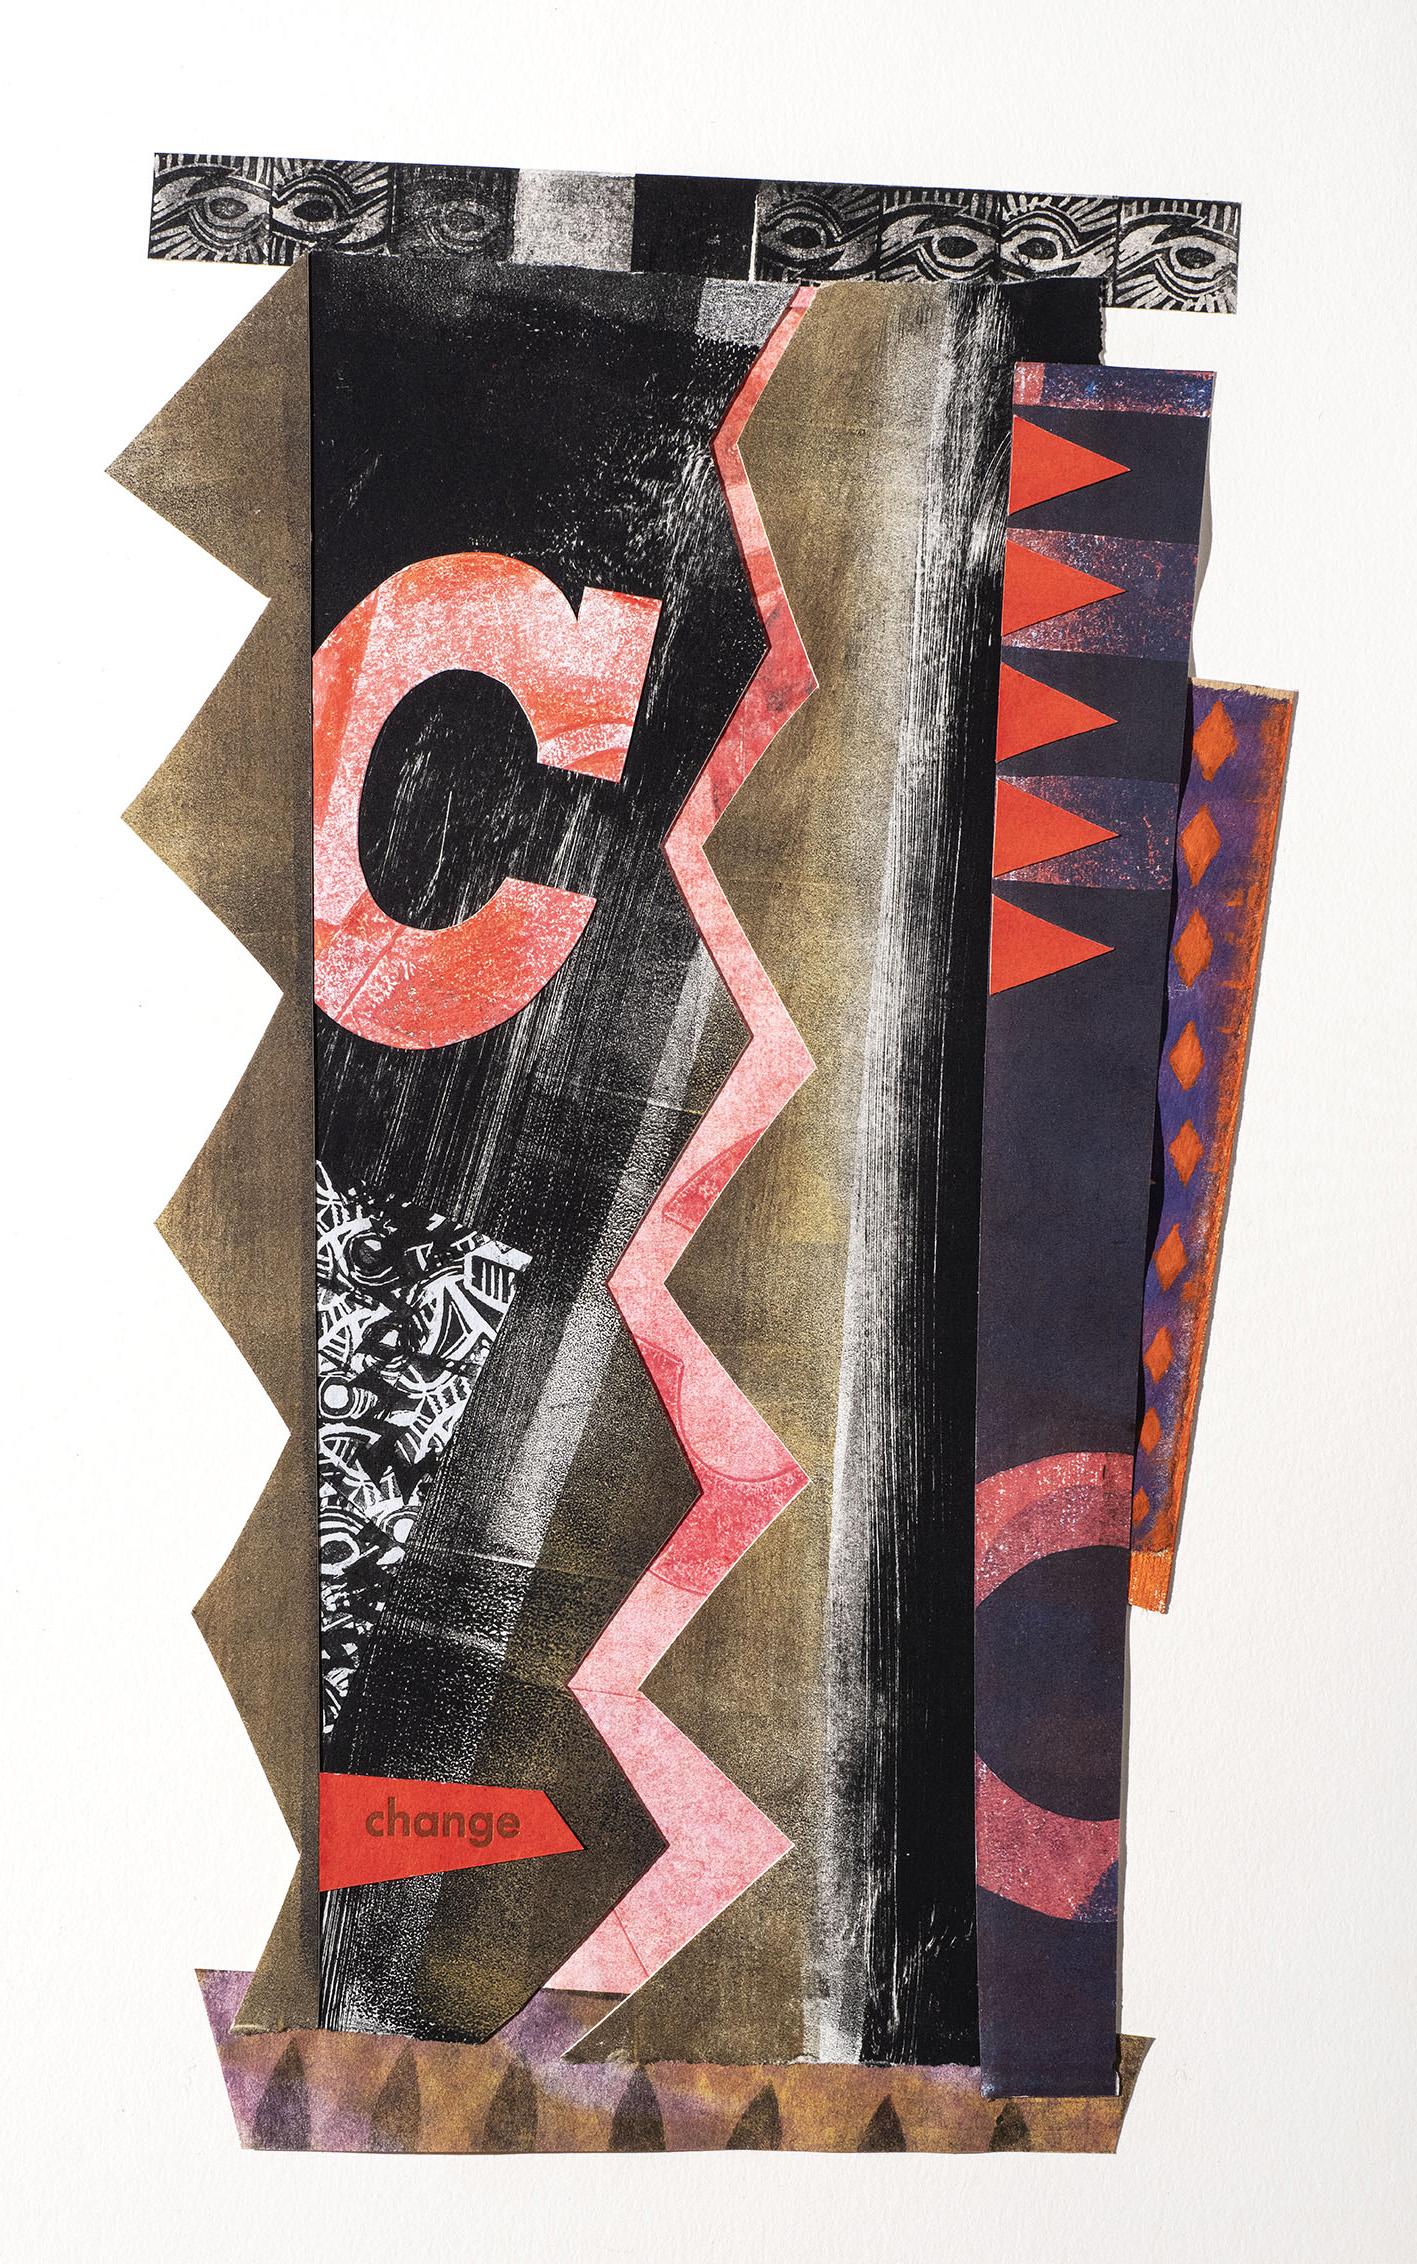 Luz Marina Ruiz, Change, Collage monotype linocut and letterpress, 16 x 10 in, 2021